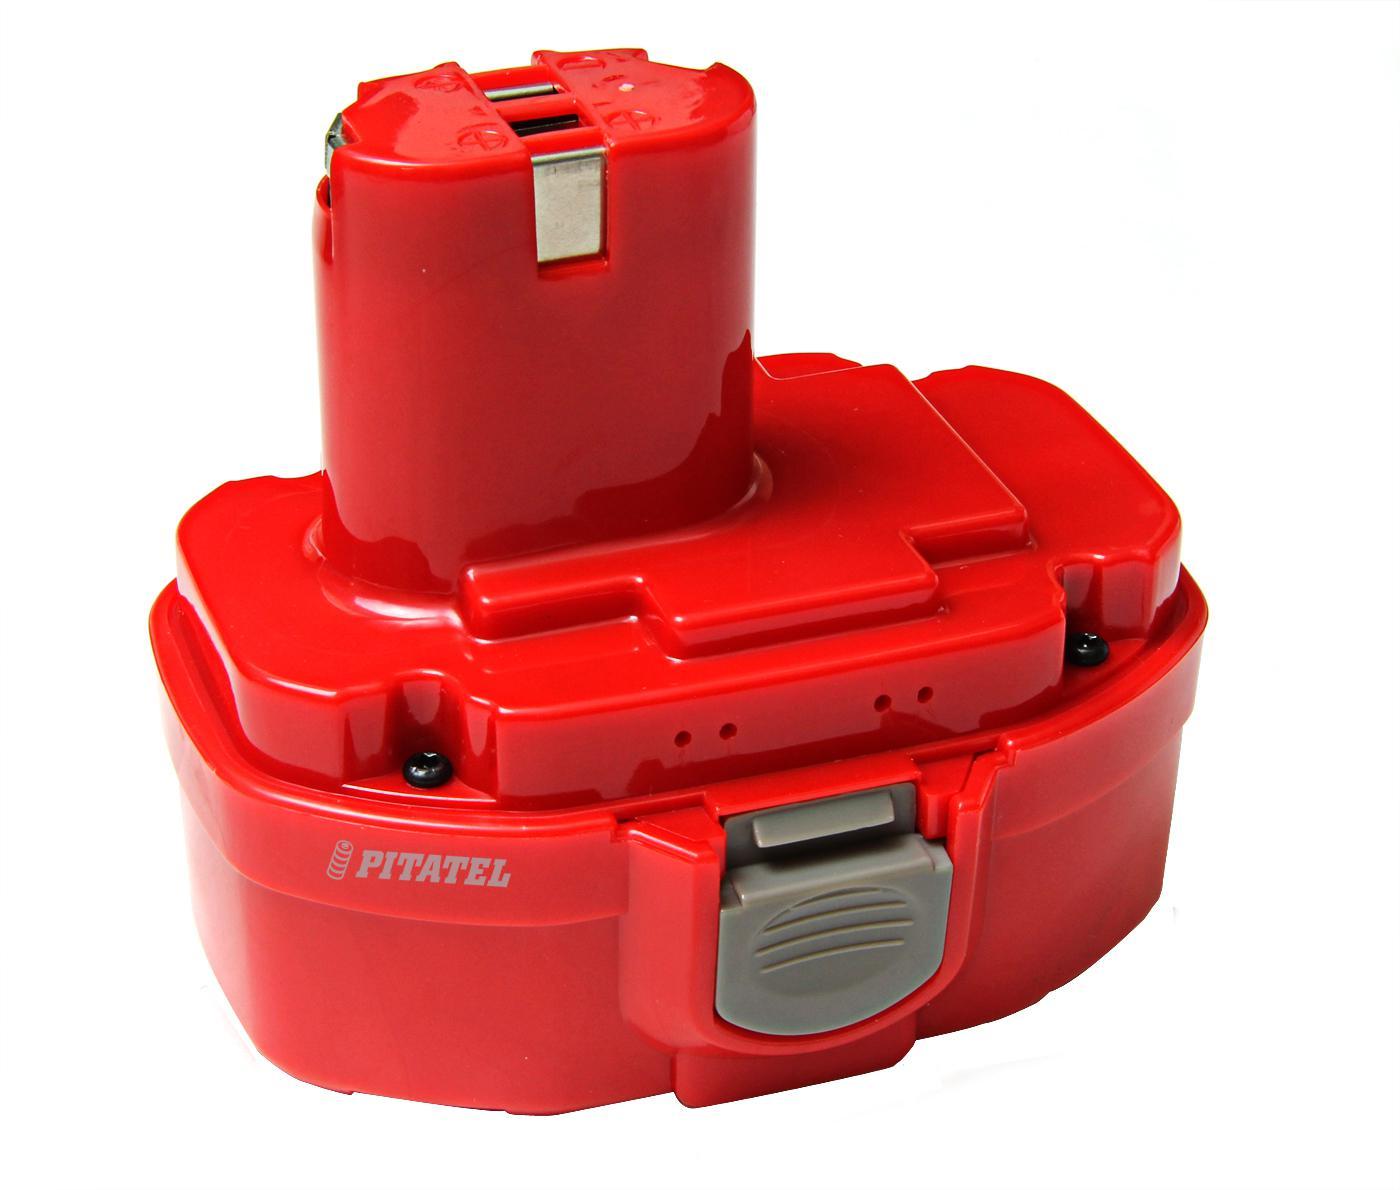 Аккумулятор Pitatel Tsb-033-mak18a-33m